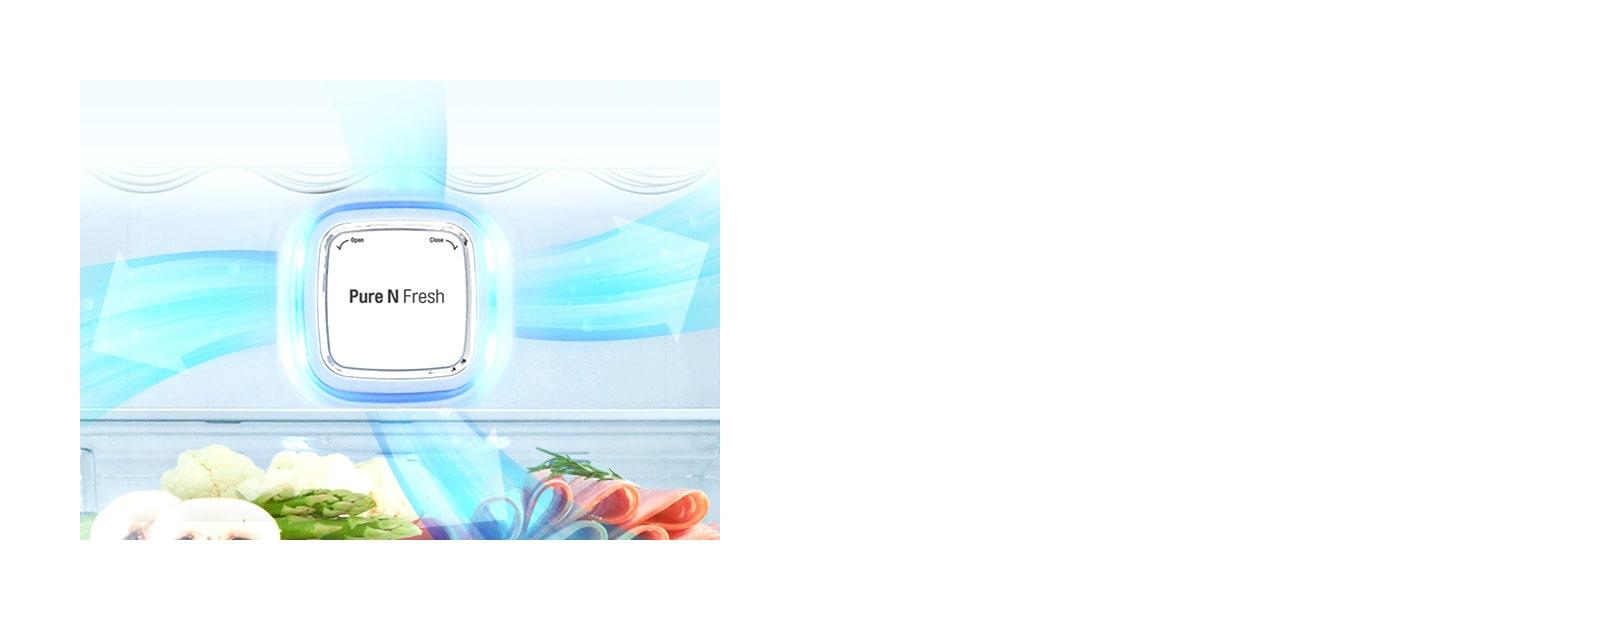 LG GC-X247CQBV Reduce Fridge Odours with Pure N Fresh